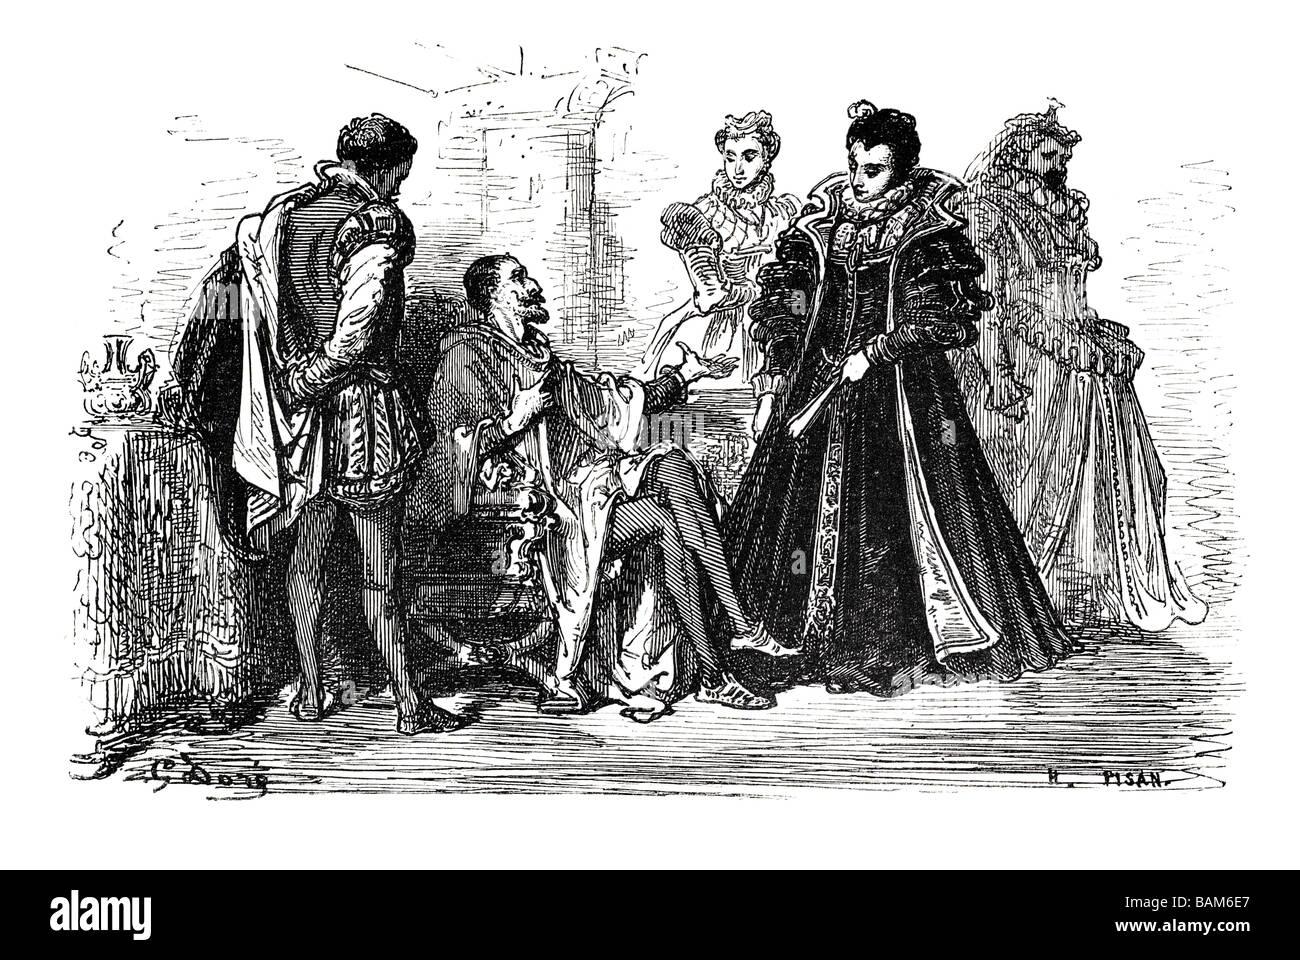 chapter XLIV 44 fourty four Don quixote spanish novel Alonso Quixano Cervantes literature quest Stock Photo